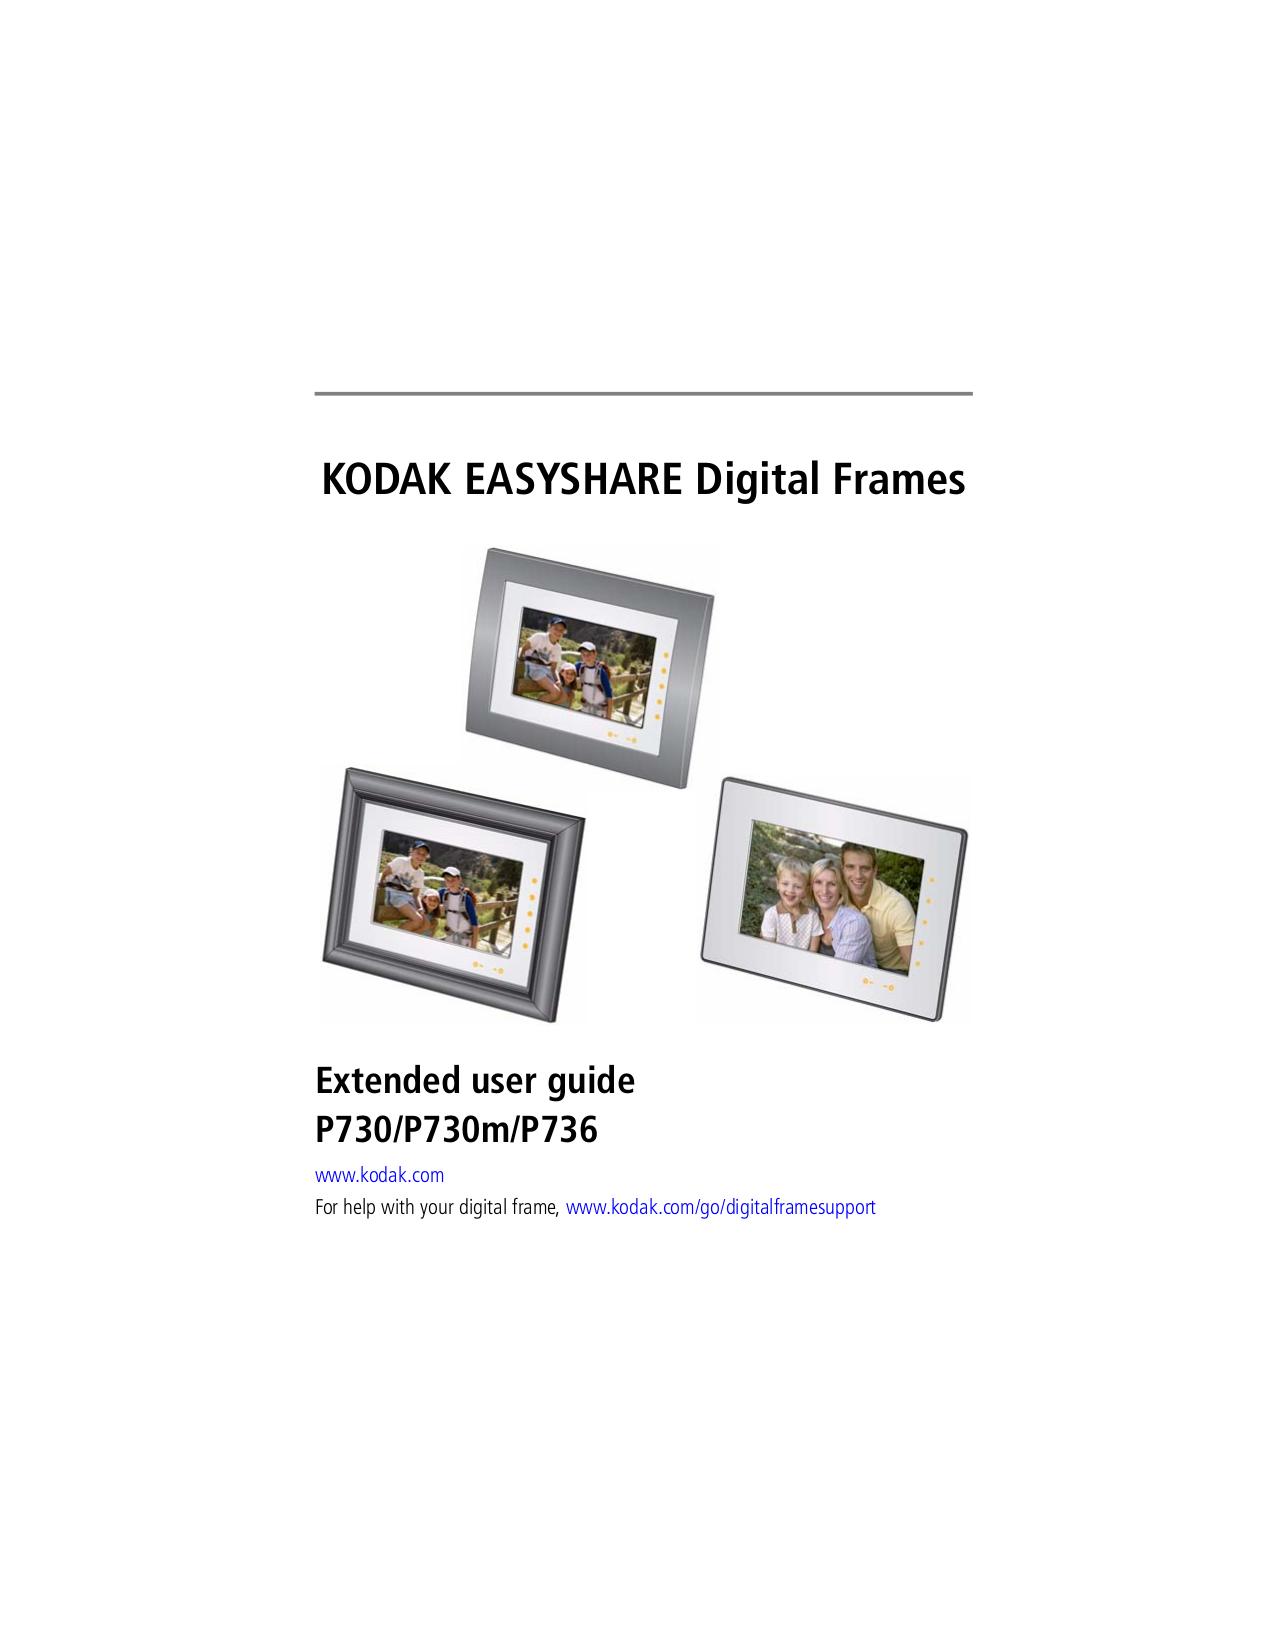 download free pdf for kodak easyshare p730 digital photo frame manual rh umlib com kodak easyshare p720 digital frame manual kodak pulse digital frame manual